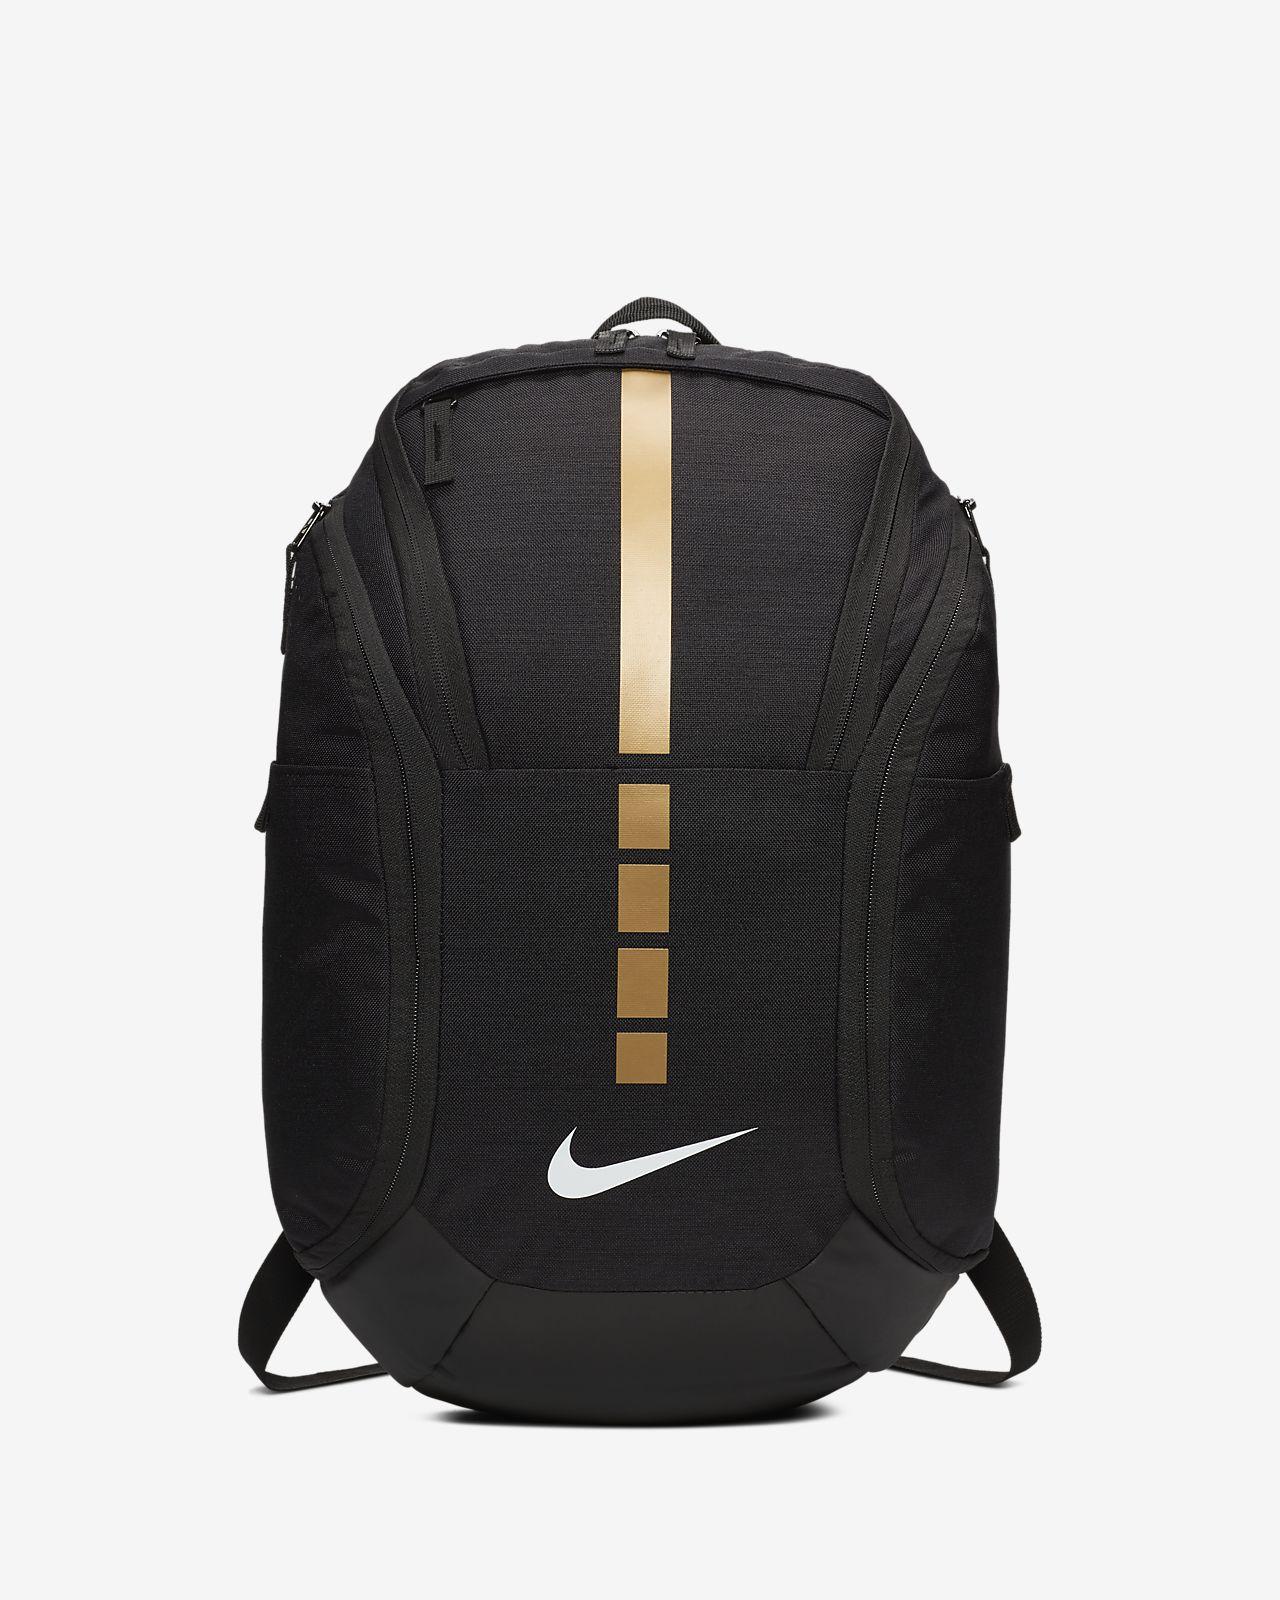 Sac à dos de basketball Nike Hoops Elite Pro (petite taille)